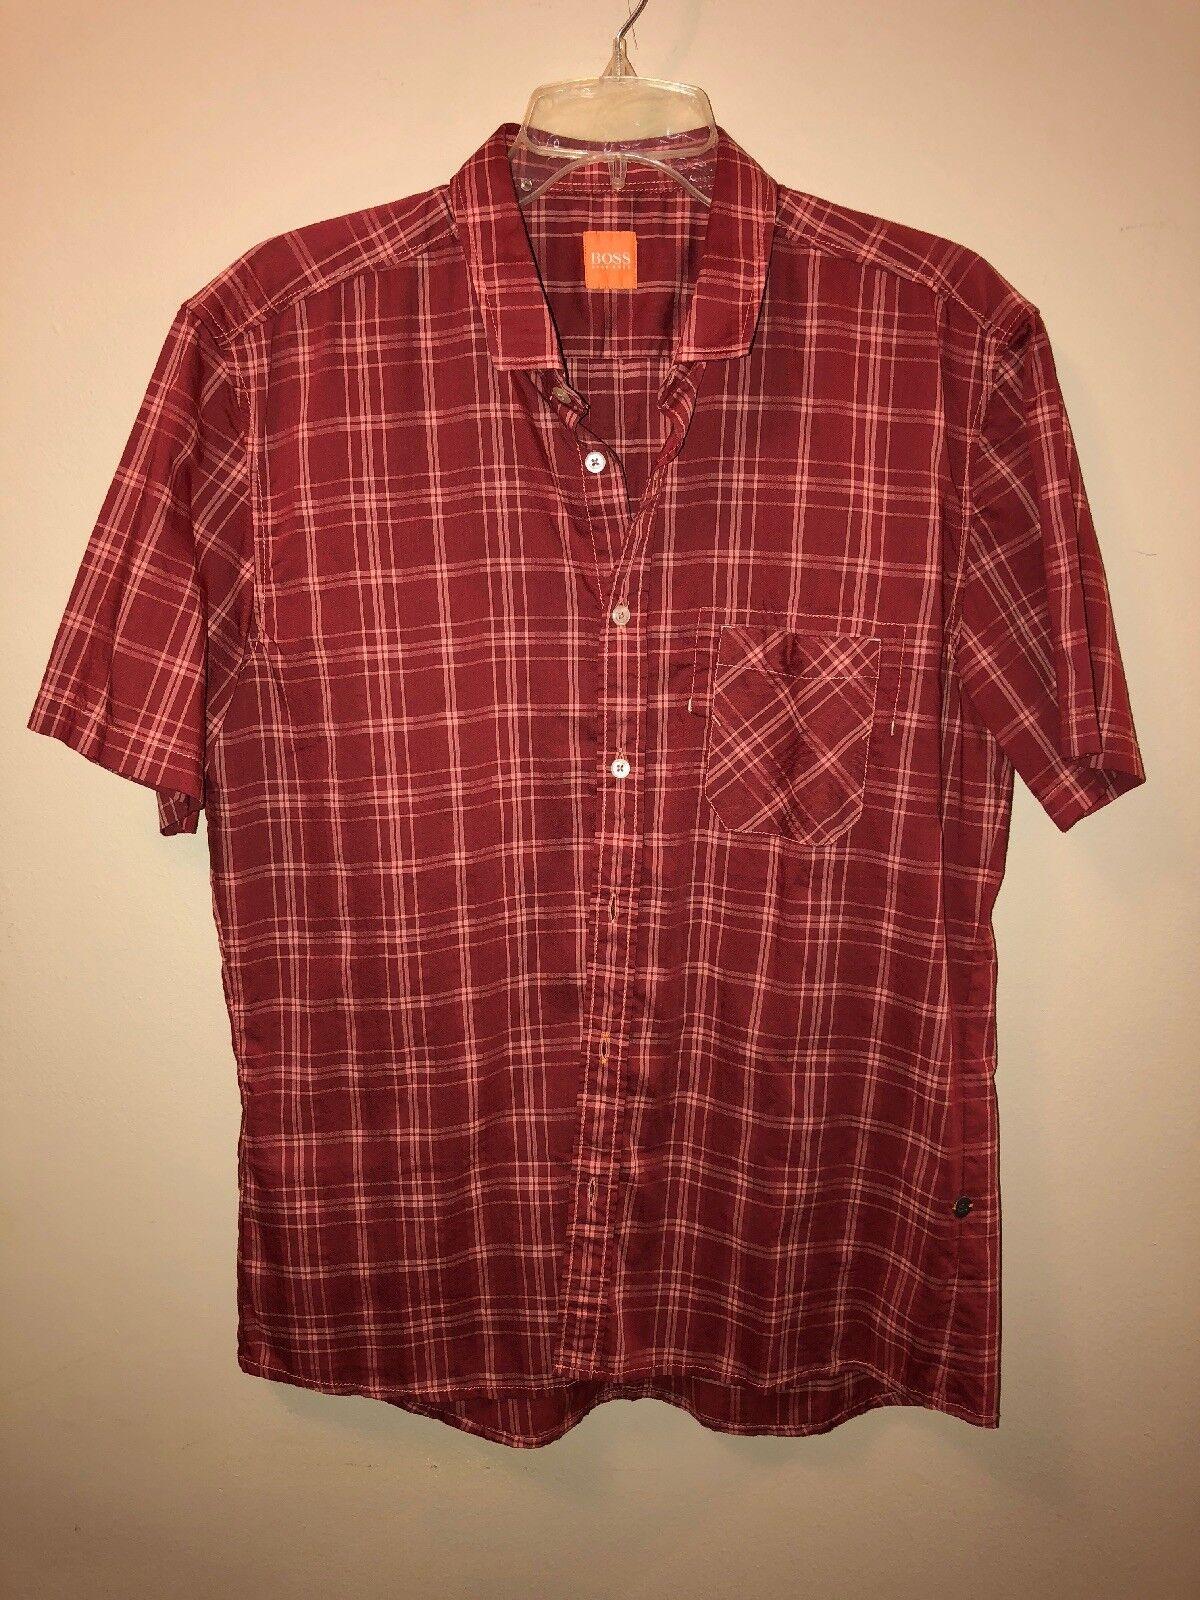 cfc6c8e4 BOSS Men's Large Red Tan Plaid SS Shirt orange + noutuq5959-Dress Shirts